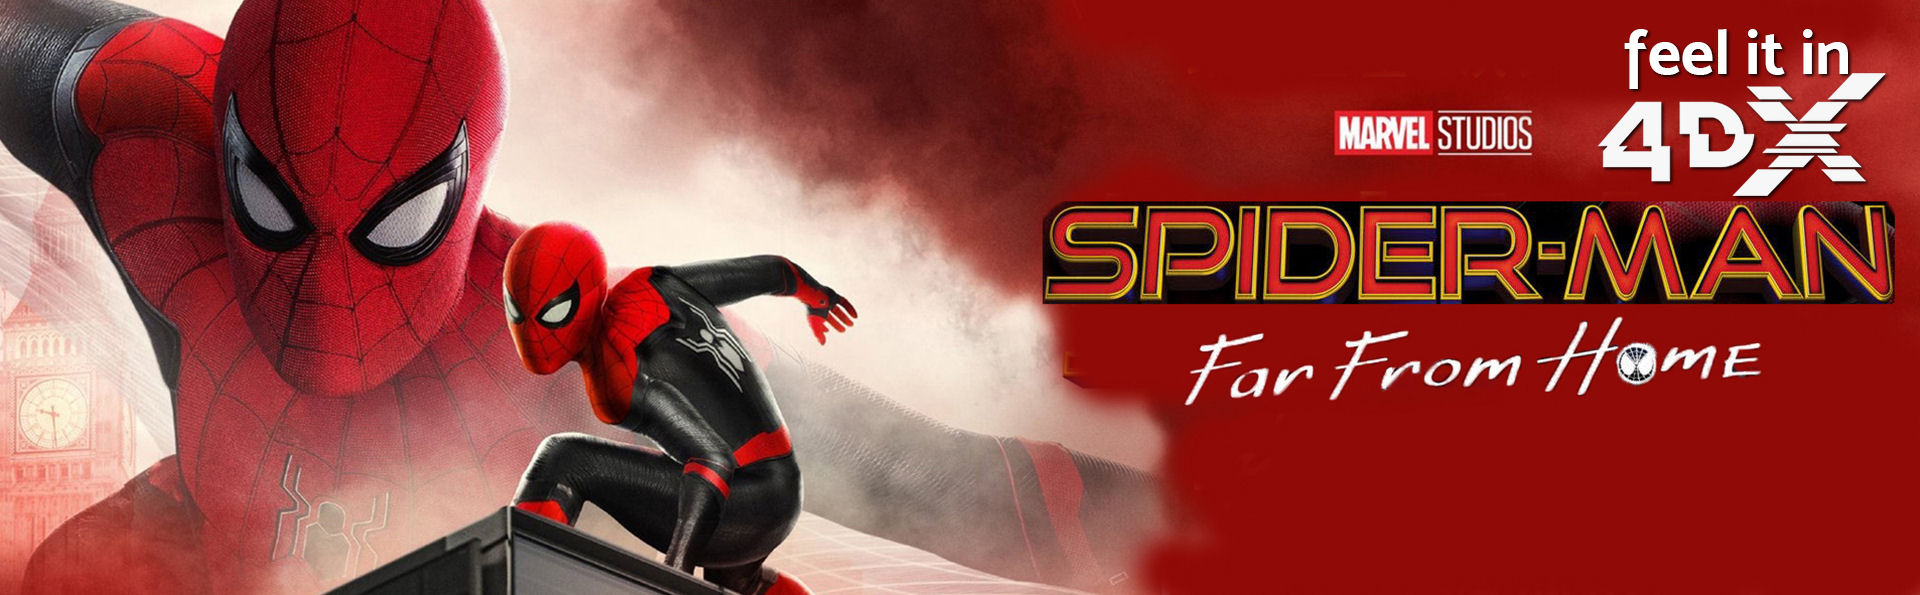 Spider-Man: Far From Home, Spider-Man